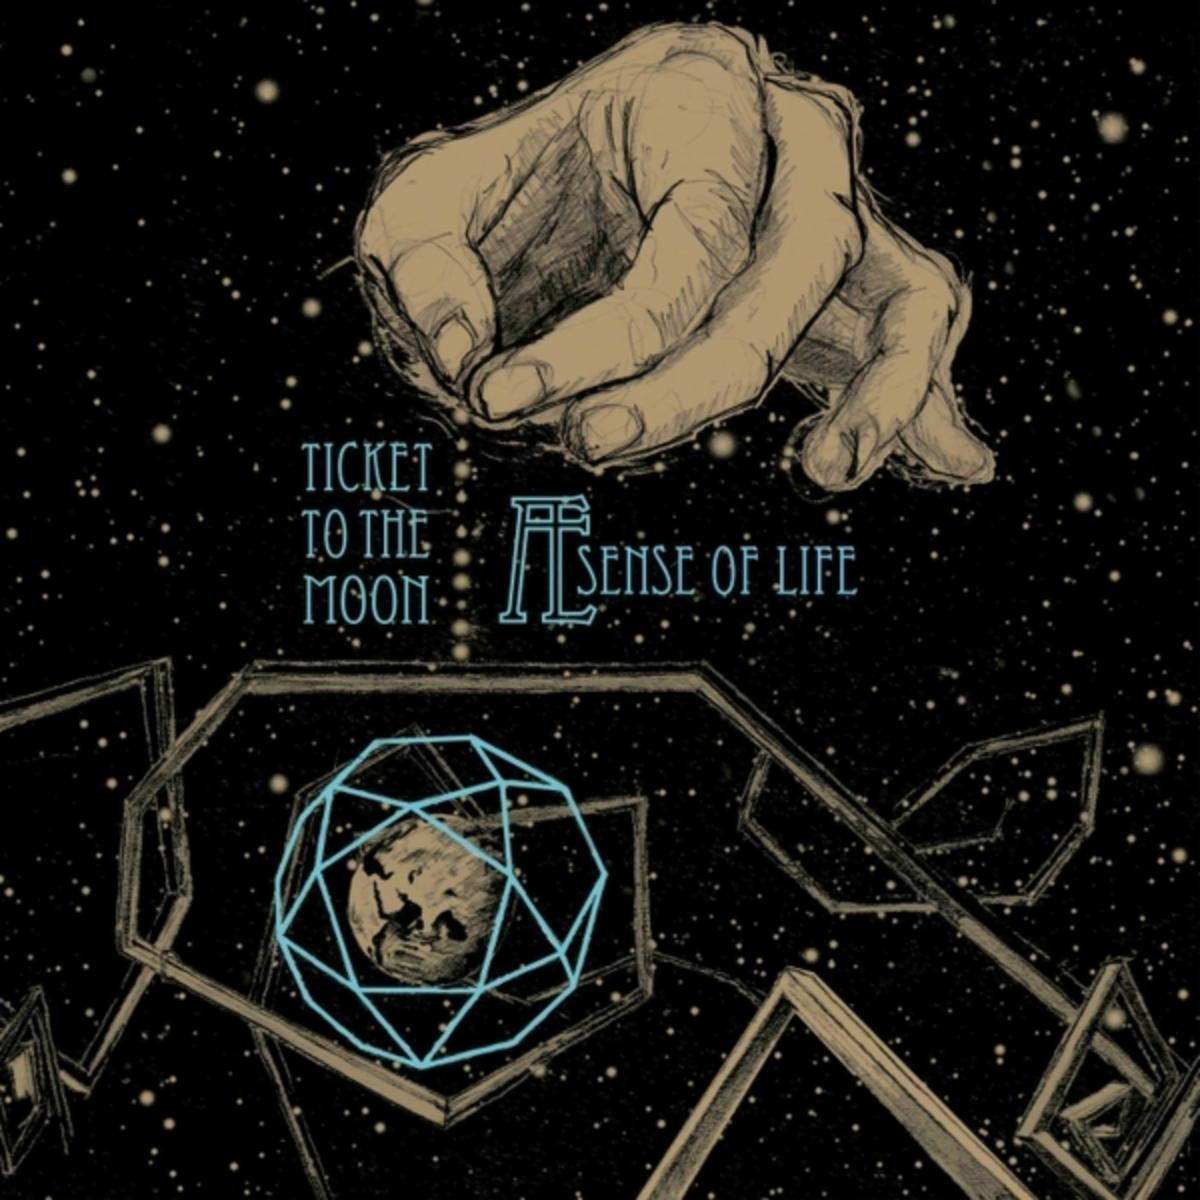 Ticket to the Moon: Æ Sense of Life